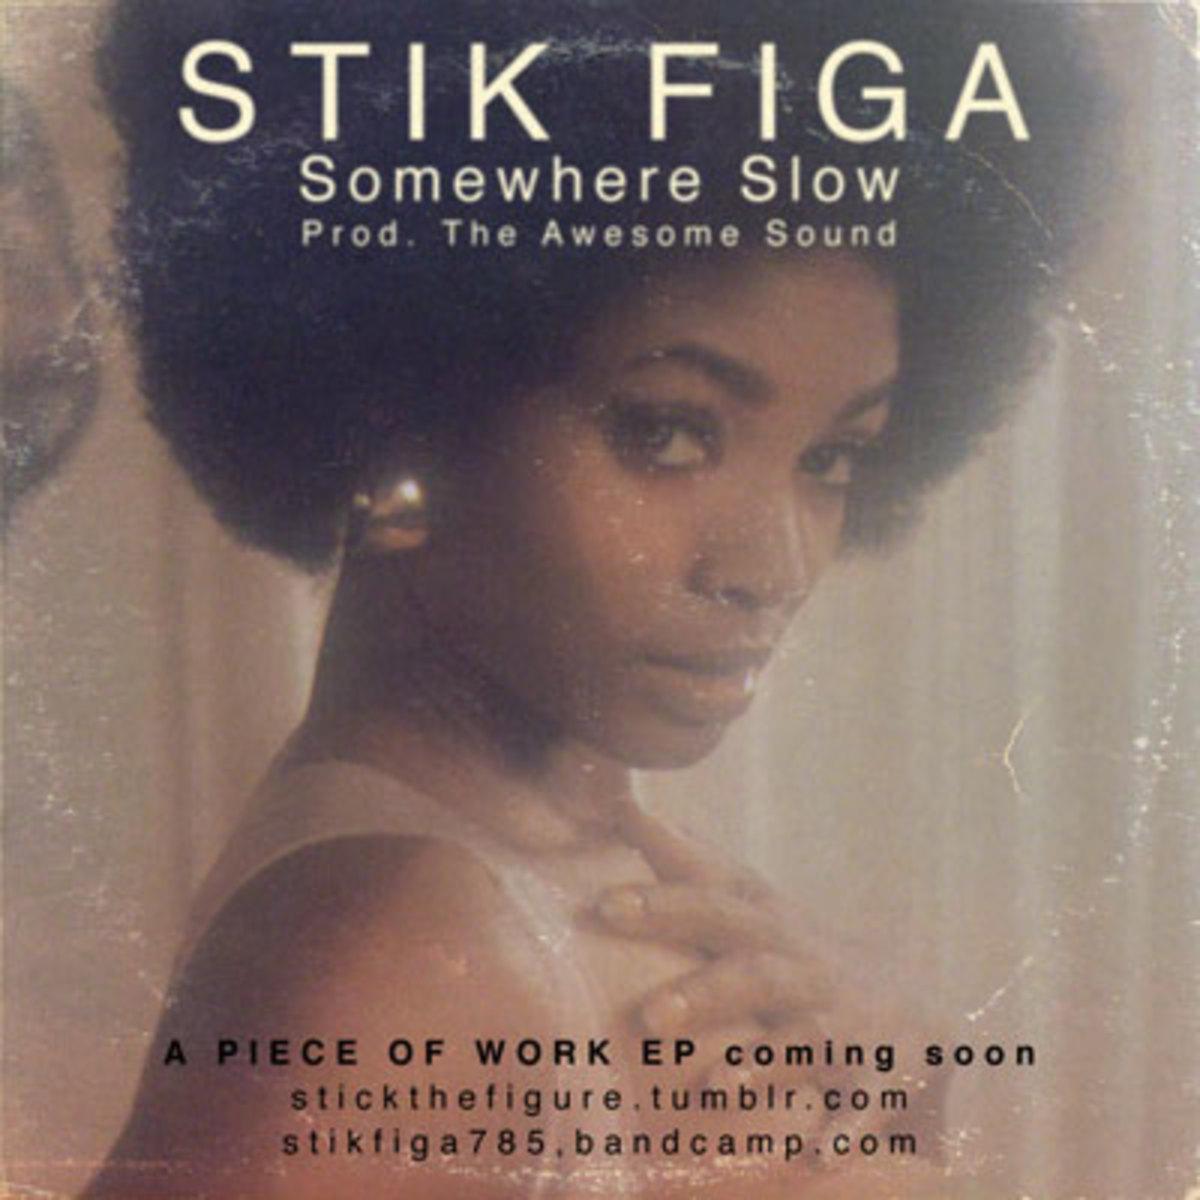 stikfiga-somewhereslow.jpg